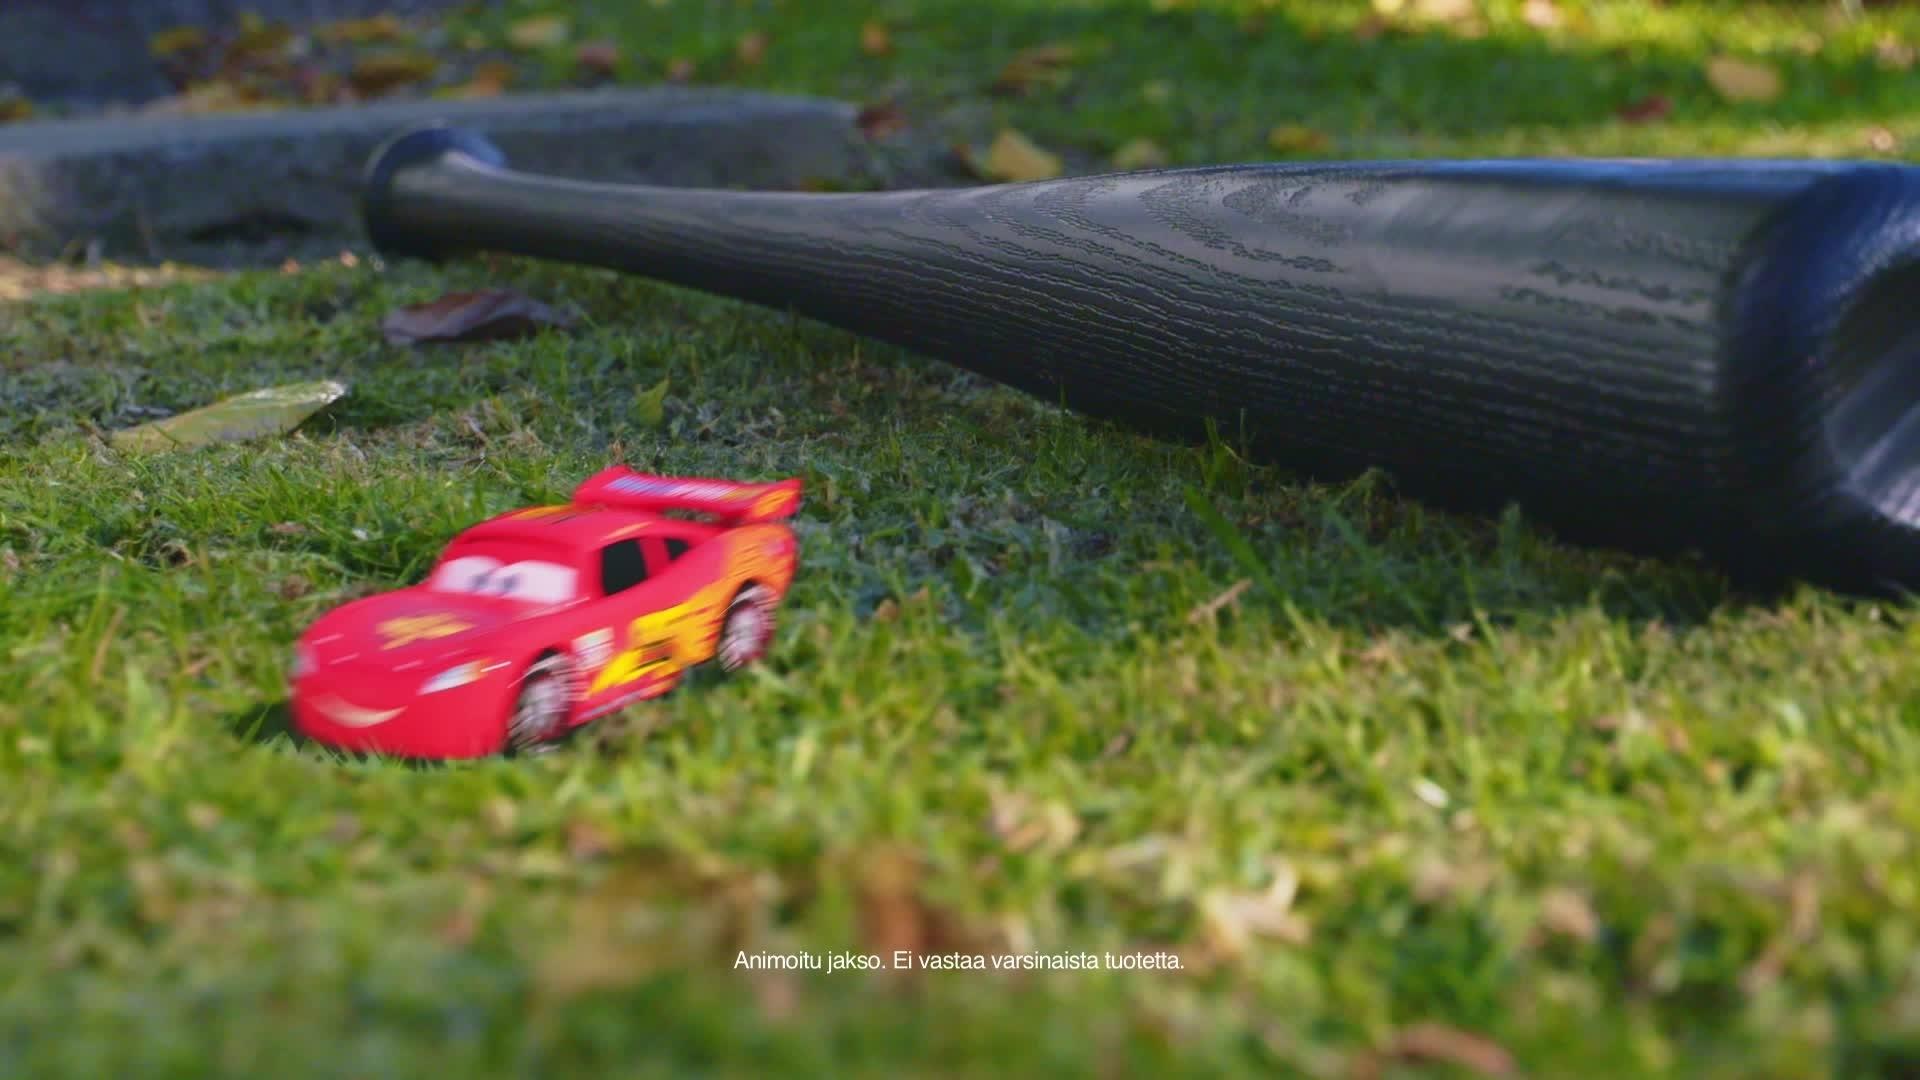 Jalkapallo-ottelu - Cars Daredevil Garage